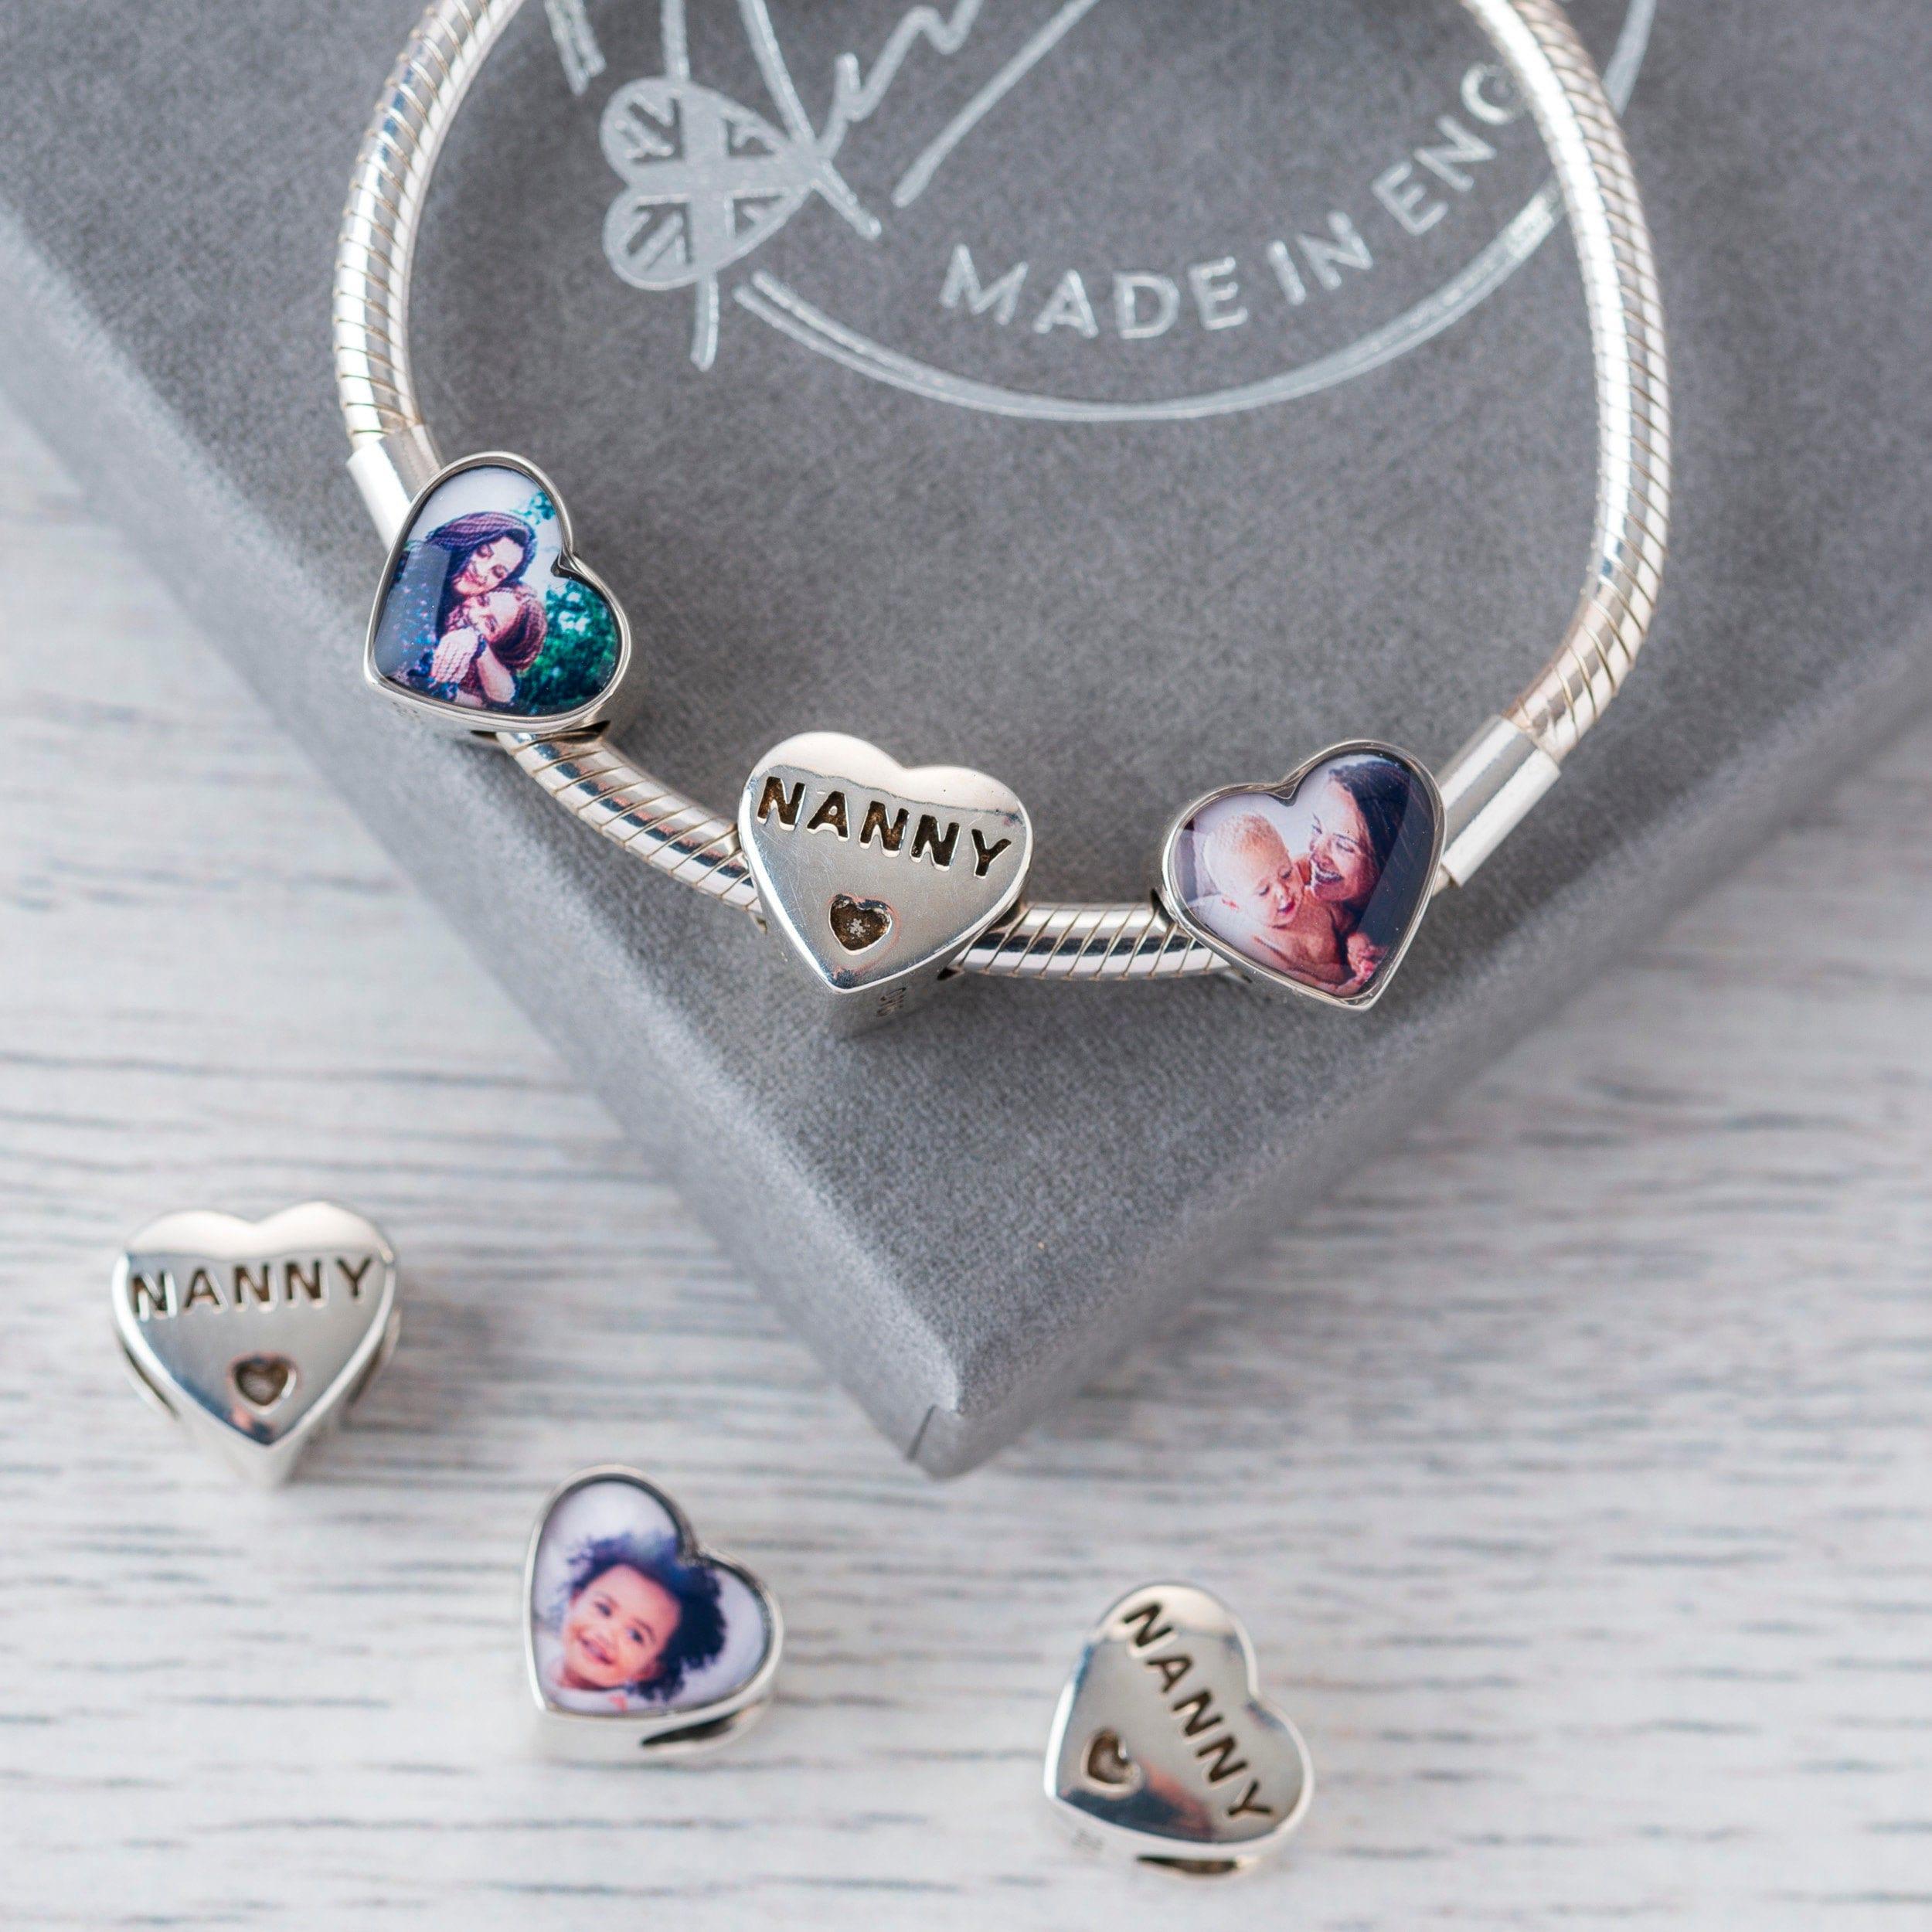 Personalized Pandora Charm Bracelet Compatible Nanny gift, New Grandma gift  Pandora Photo charms, Silver charms, UK shops Custom Charms